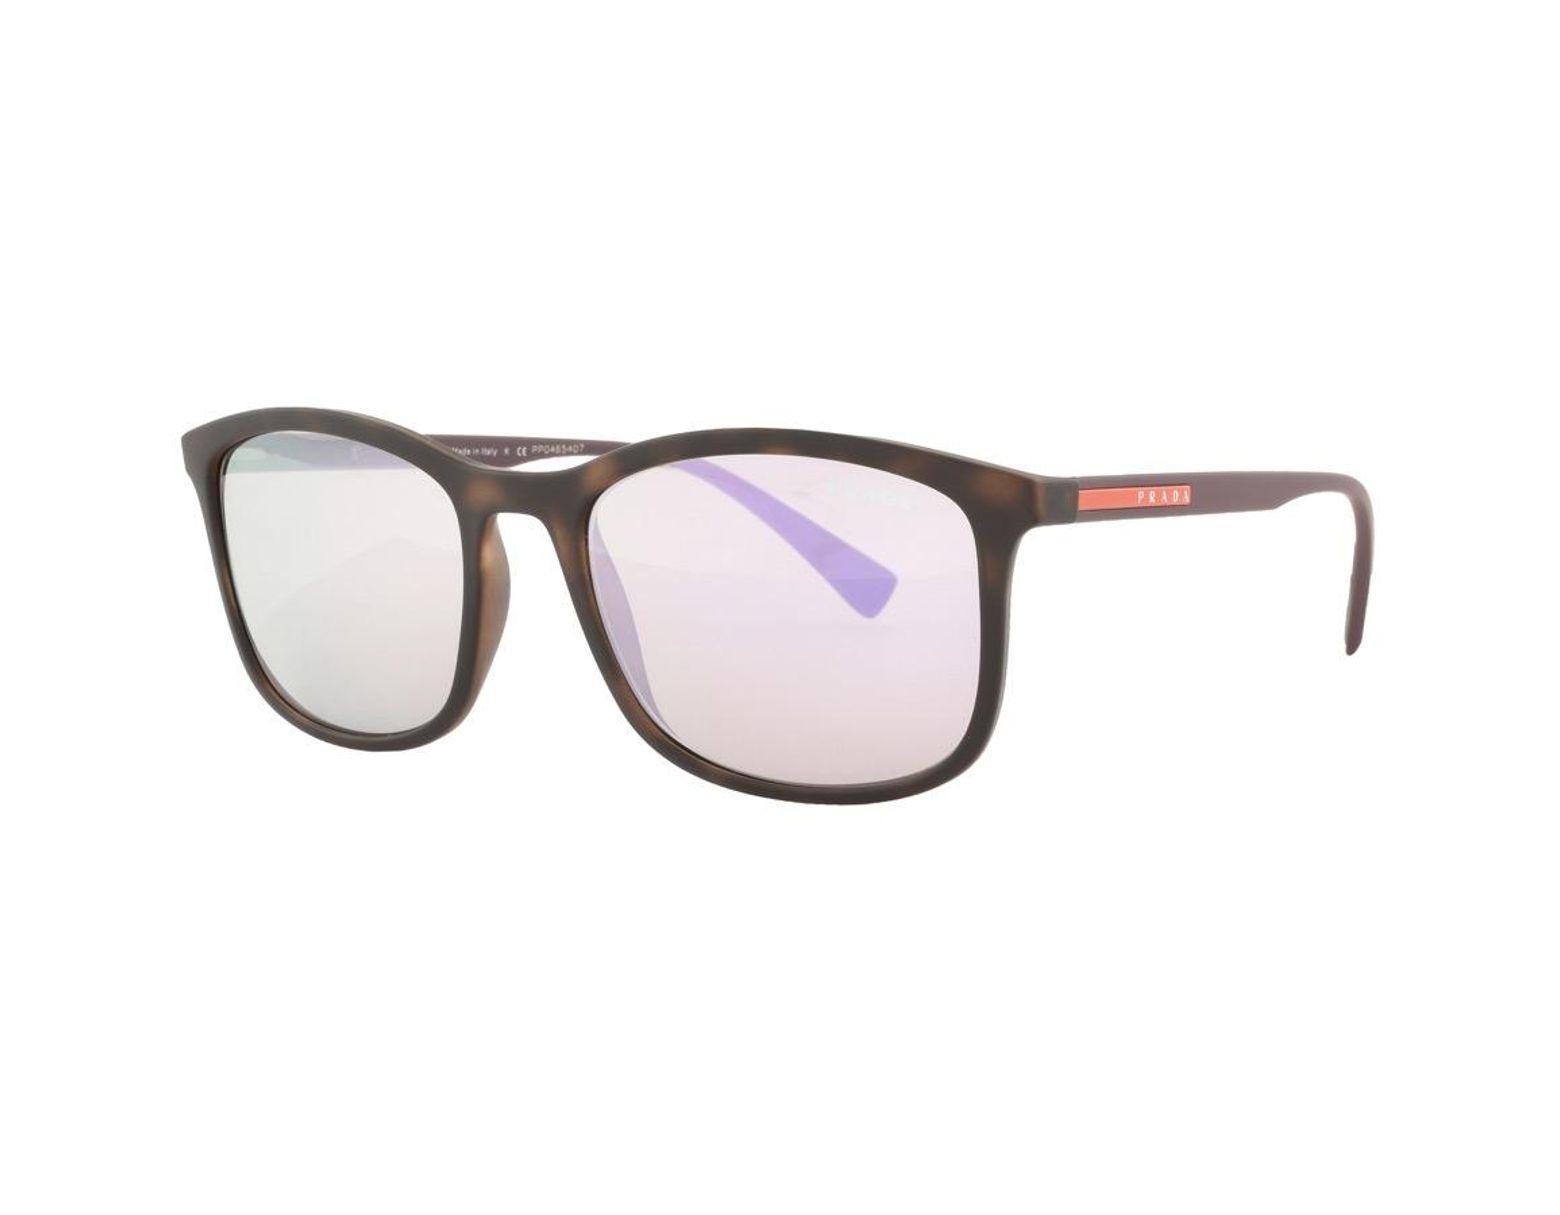 f546ff80b13c Prada Linea Rossa Sunglasses Purple in Purple for Men - Lyst